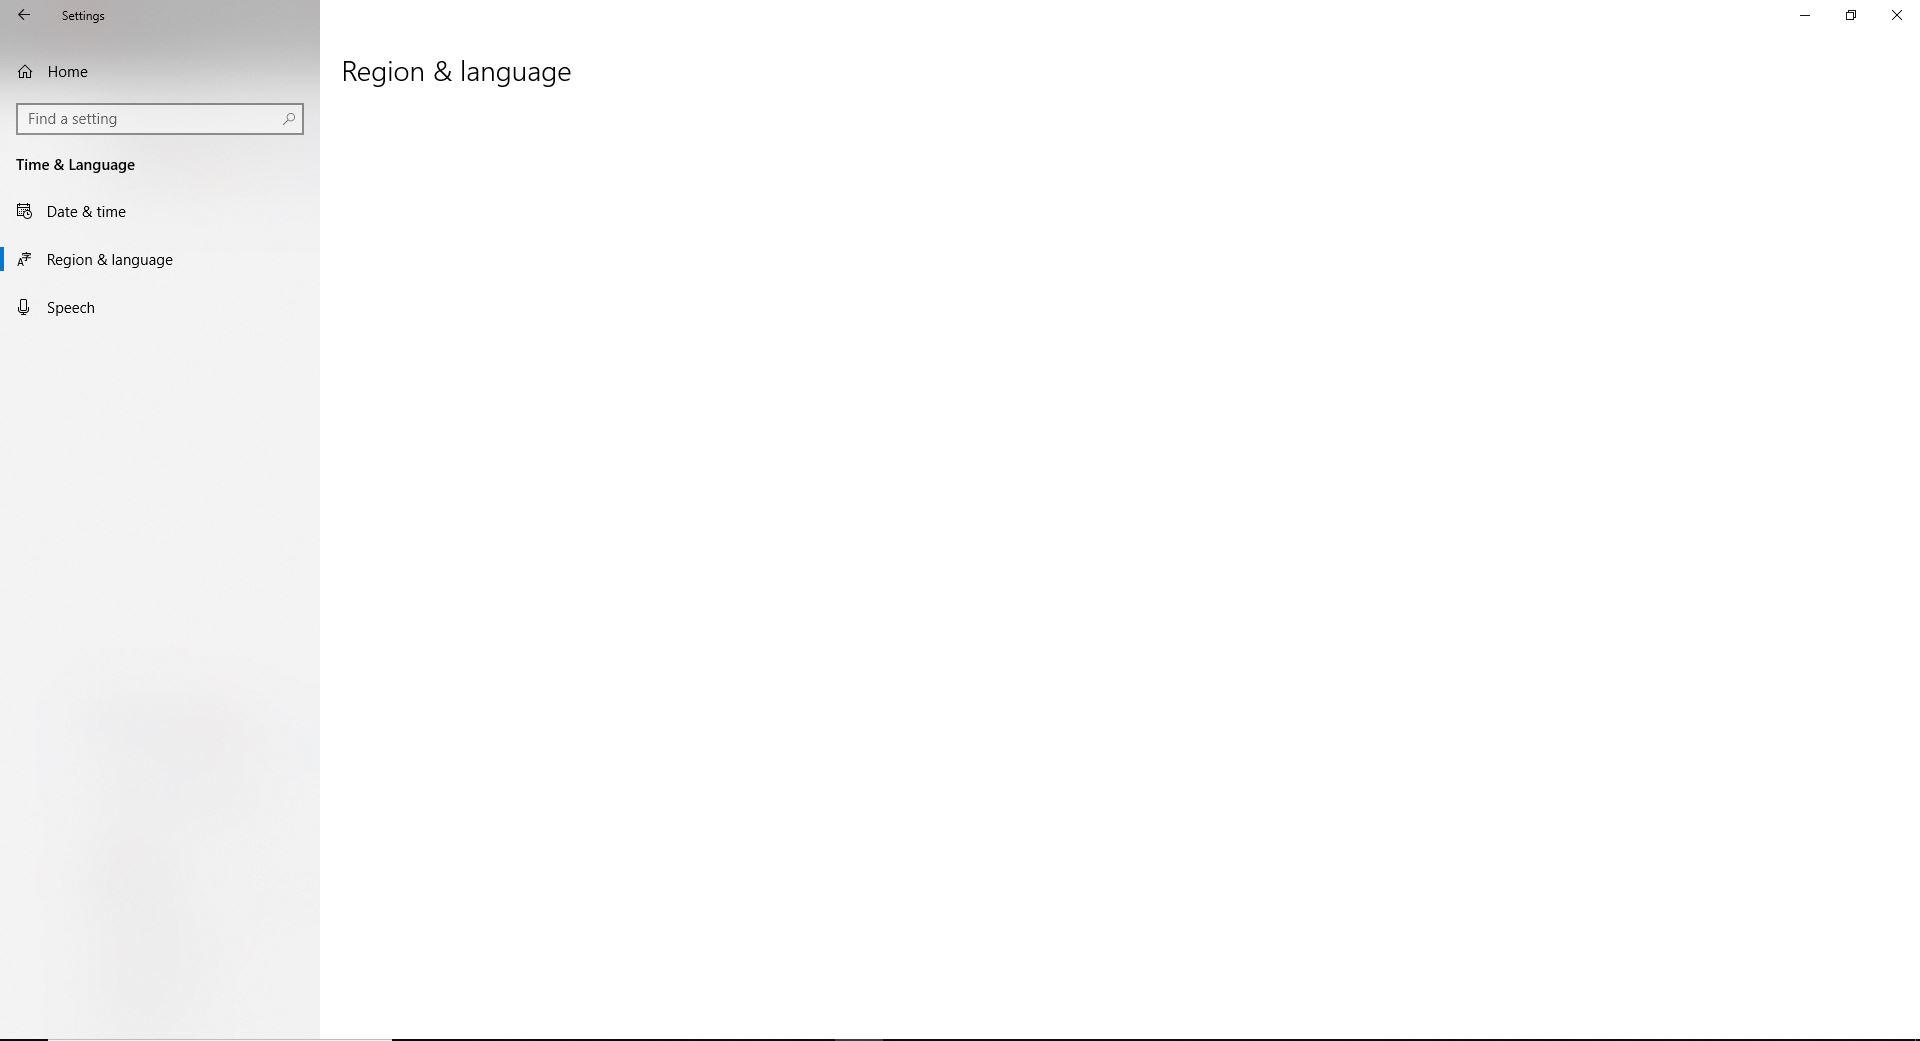 Region & Language 66bed2e7-9ef8-4225-8445-9a853c3a775f?upload=true.jpg